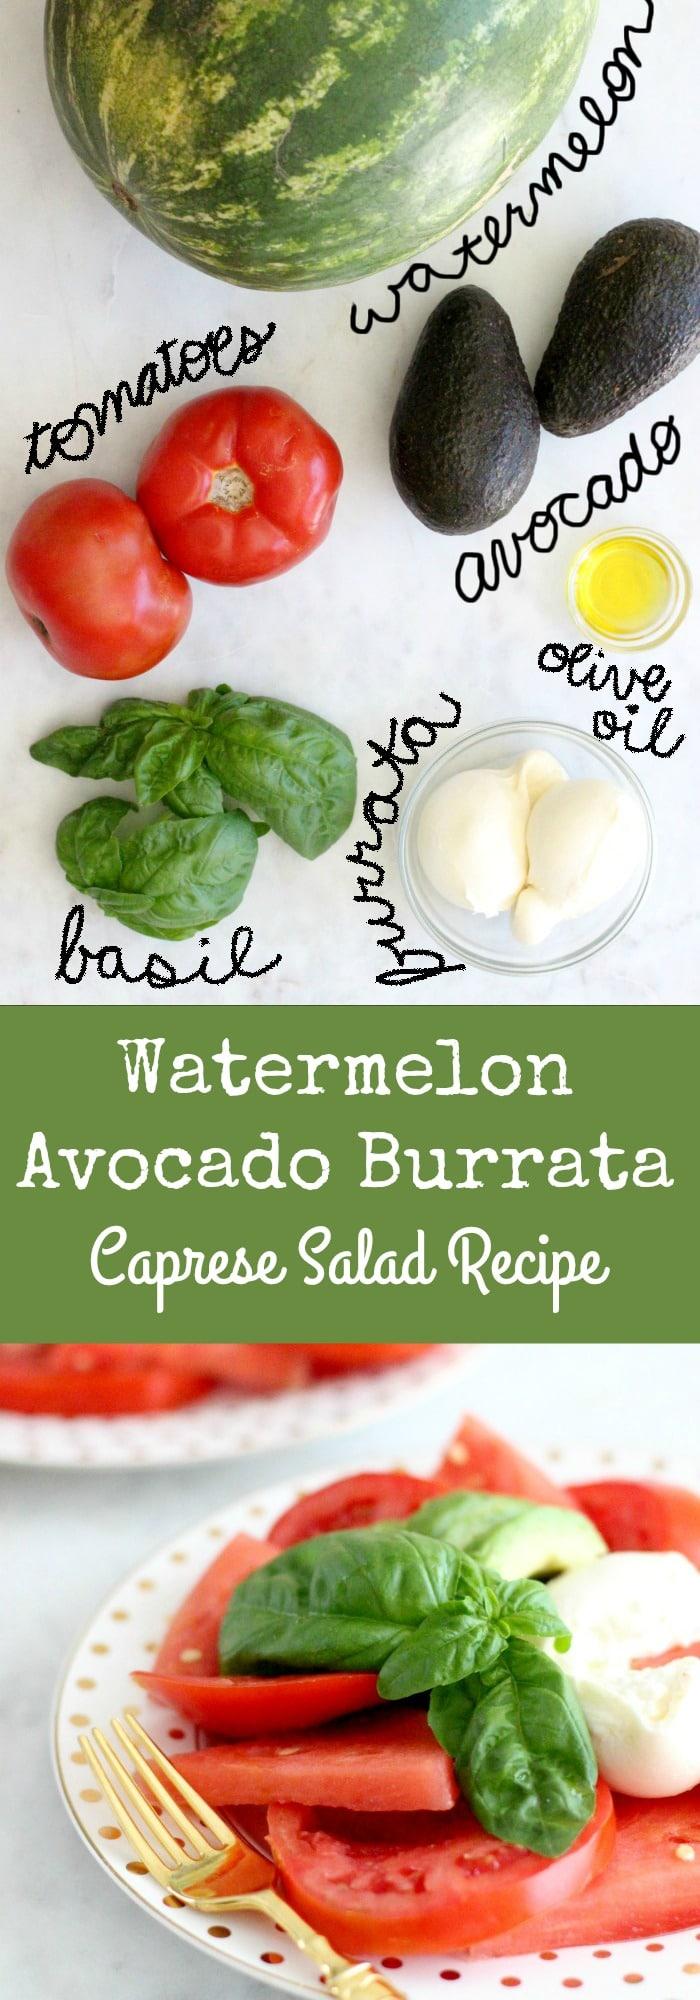 Simple Watermelon Avocado Burrata Caprese Salad Recipe